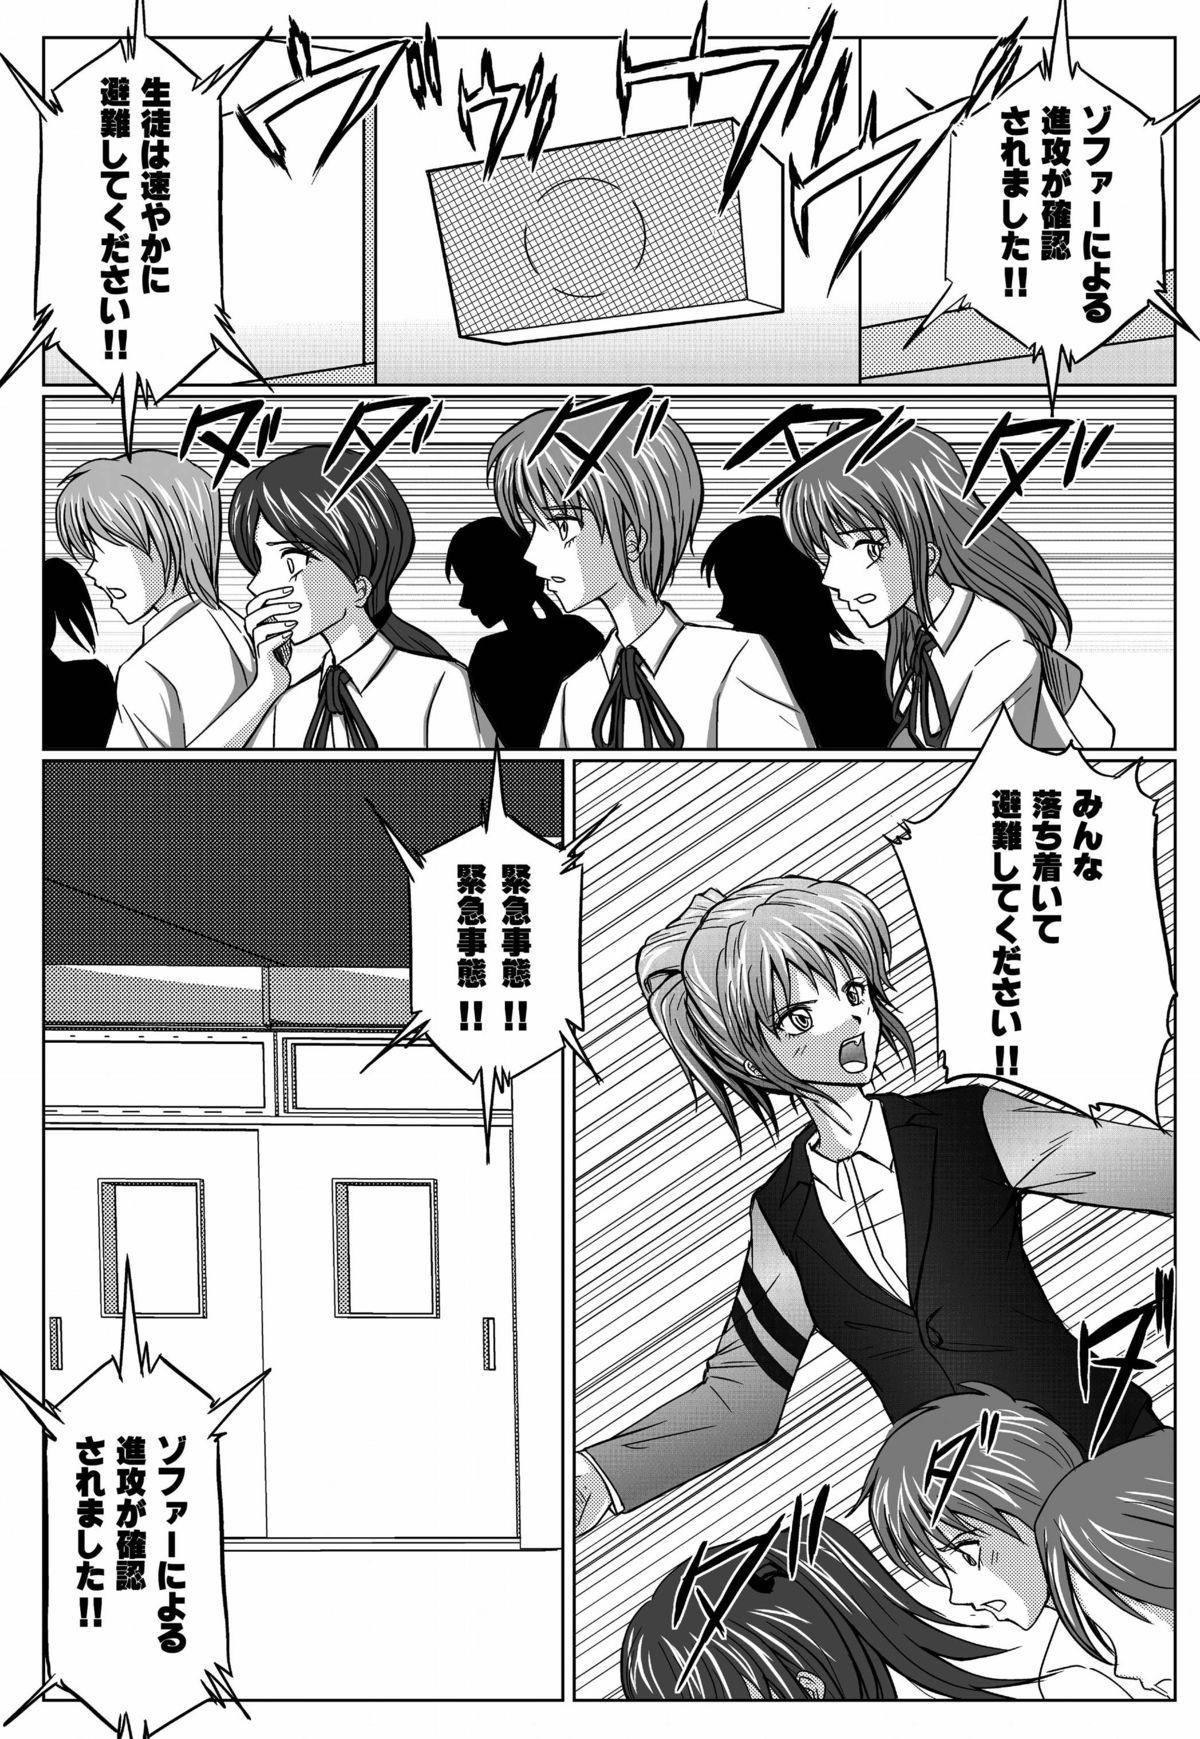 [Macxe's (monmon)] Tokubousentai Dinaranger ~Heroine Kairaku Sennou Keikaku~ Vol.01/02/03 (Renkaban) [Digital] 131